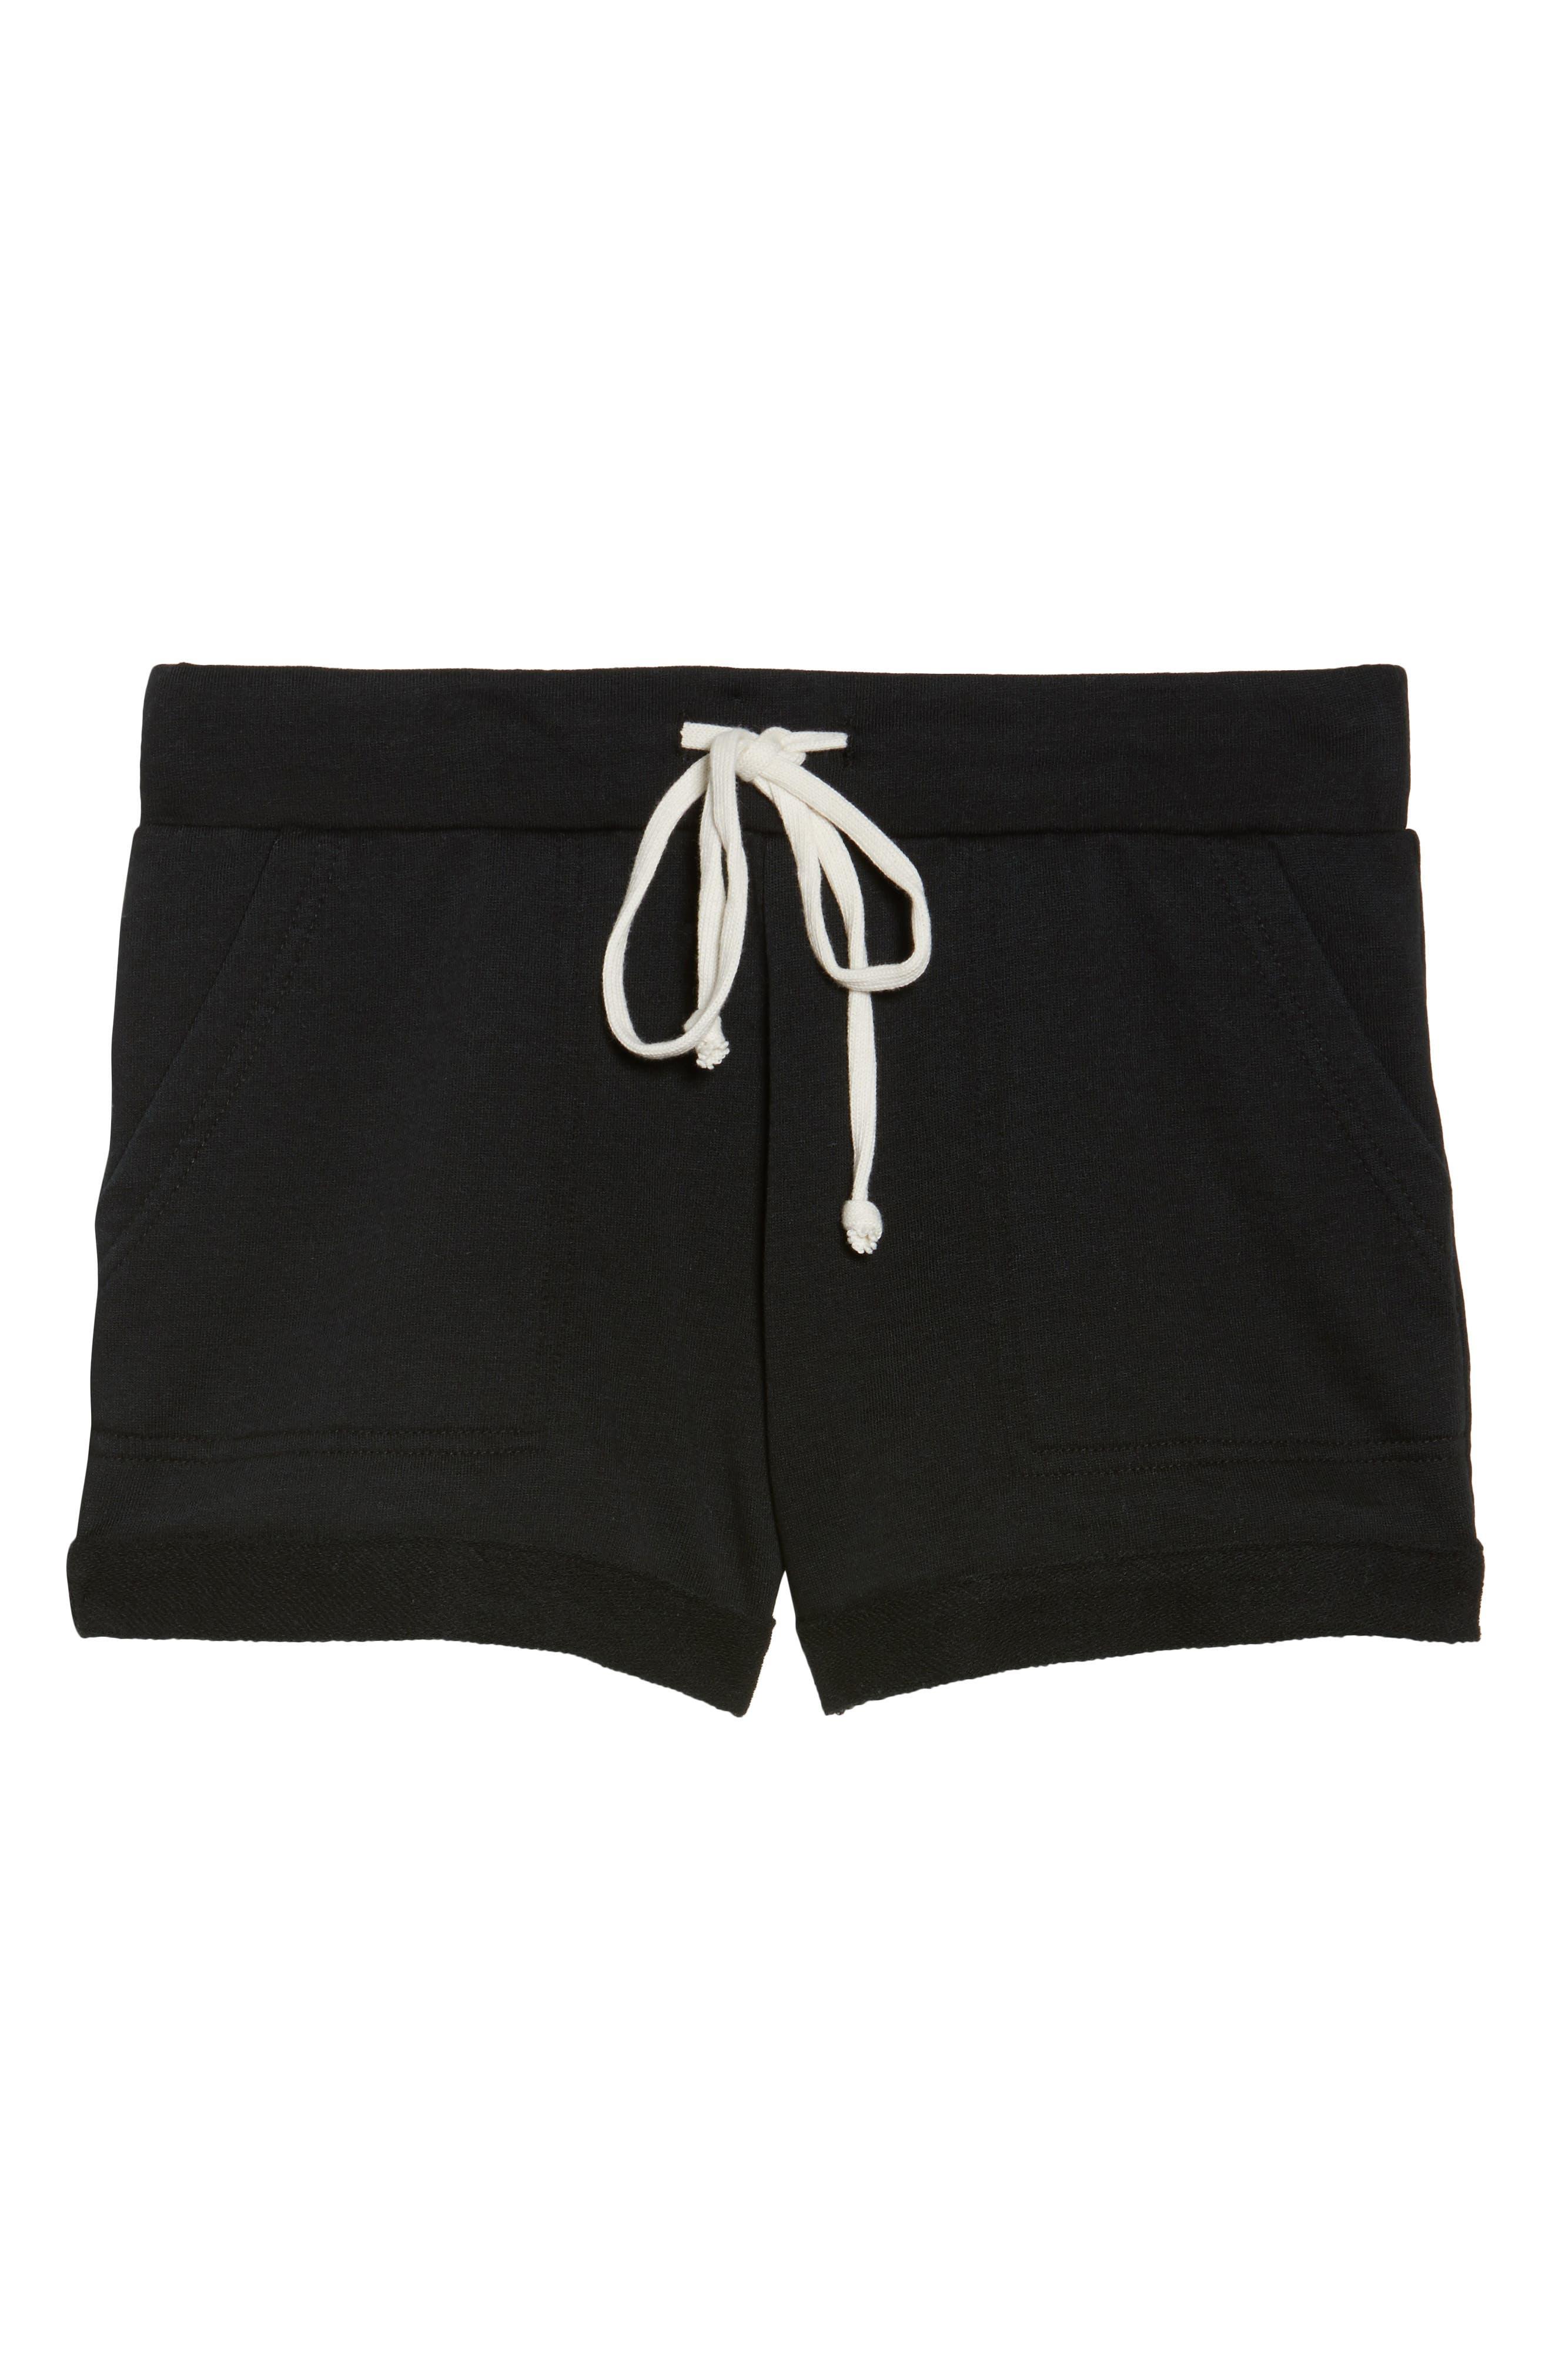 Lounge Shorts,                             Alternate thumbnail 6, color,                             003